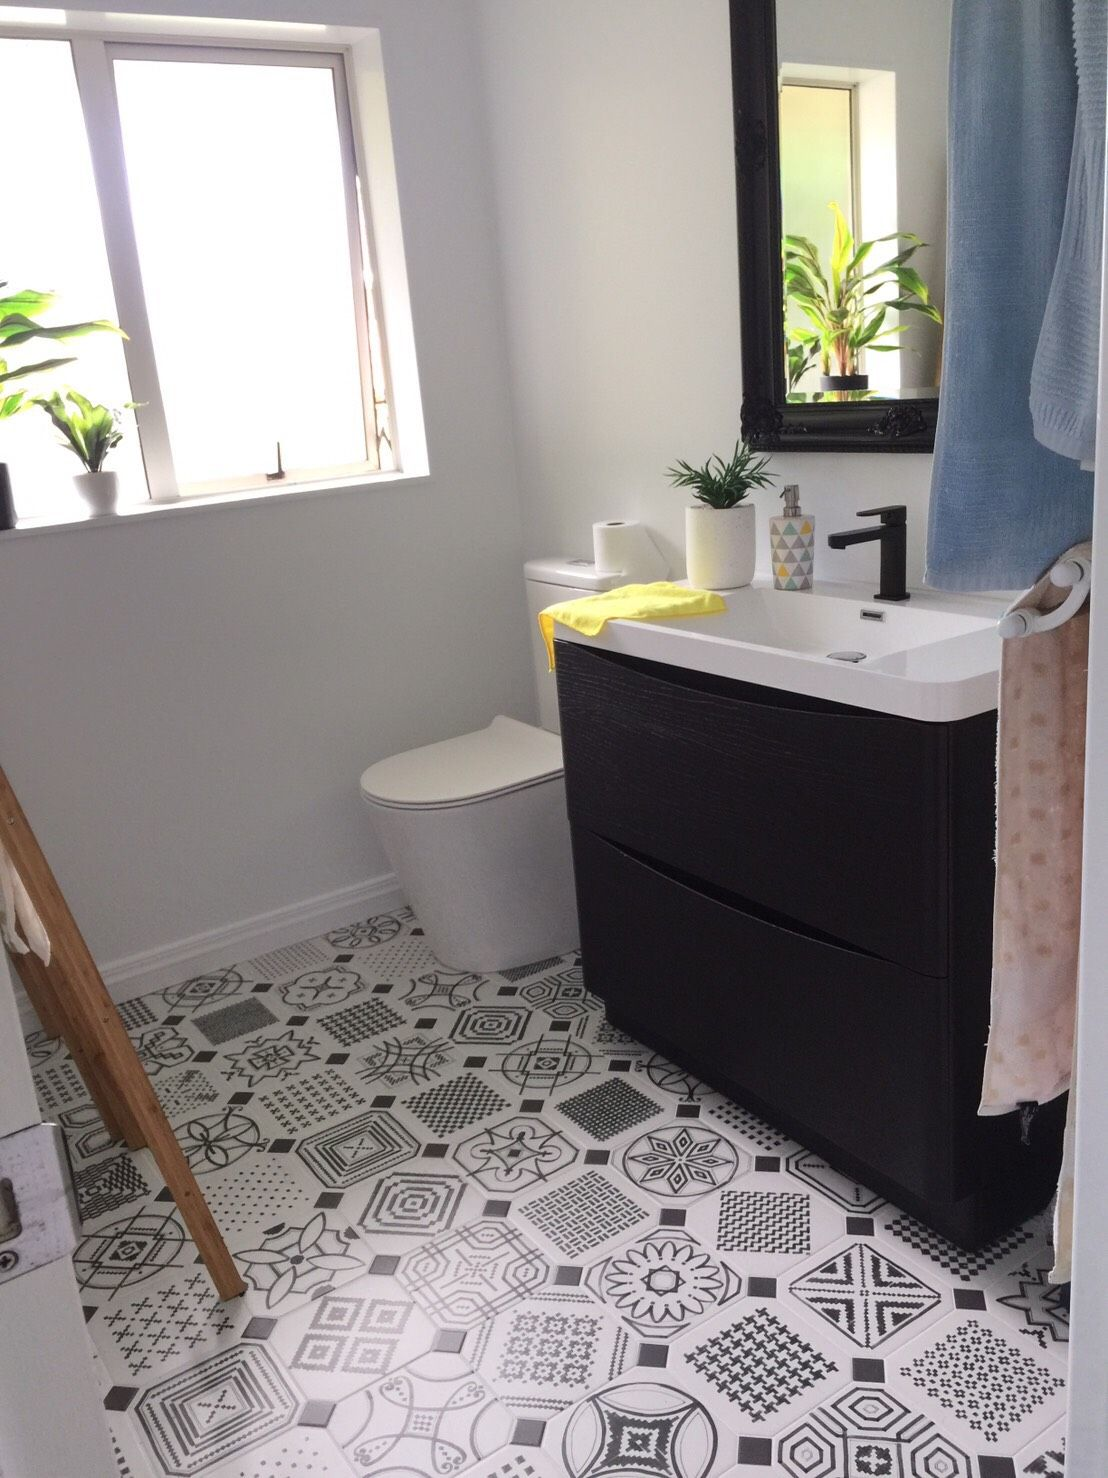 Monochrome Decorative tile Bathroom ideas Tile used